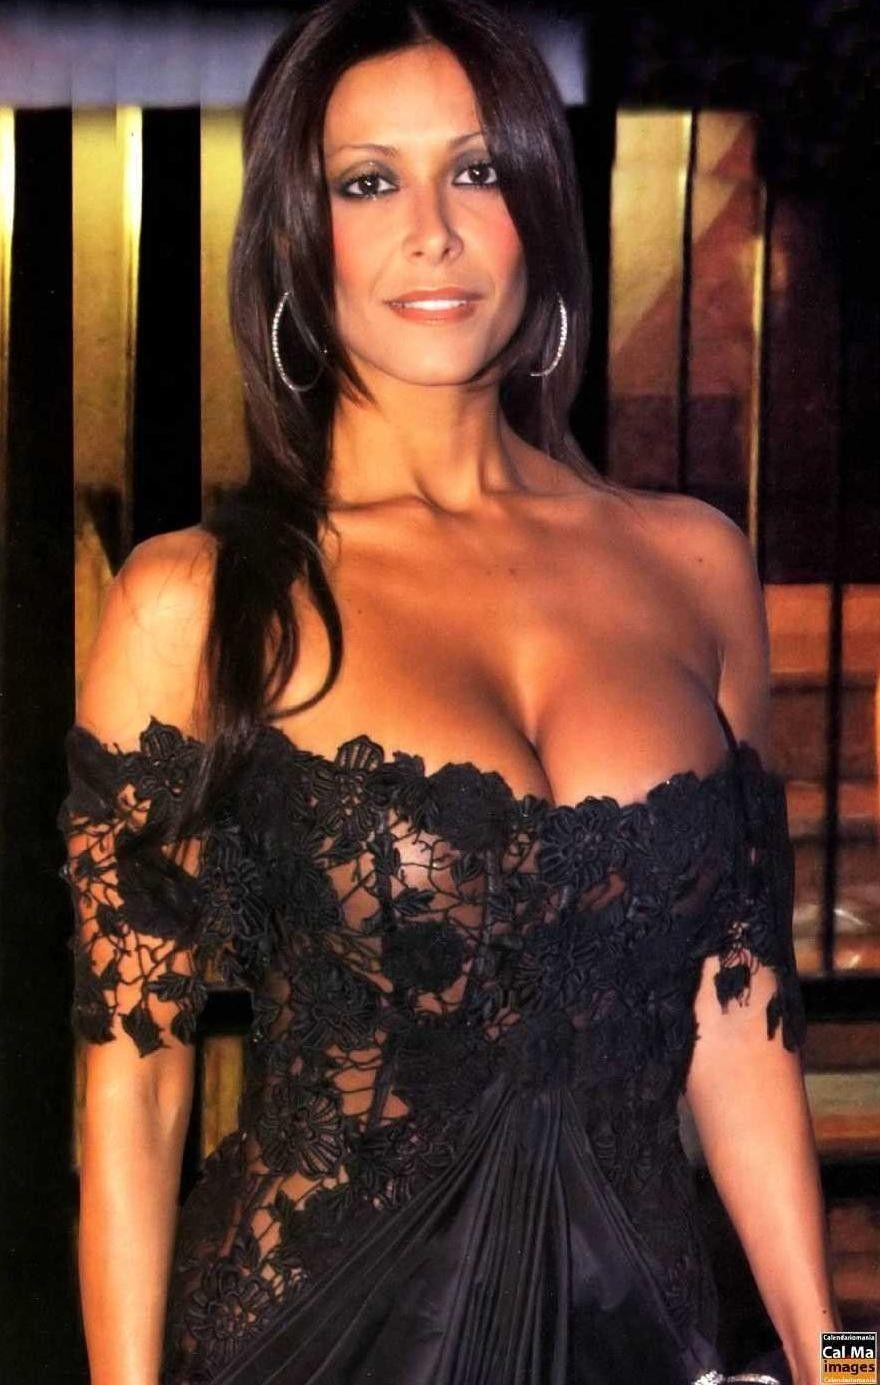 pinrory o on hot older women | pinterest | woman